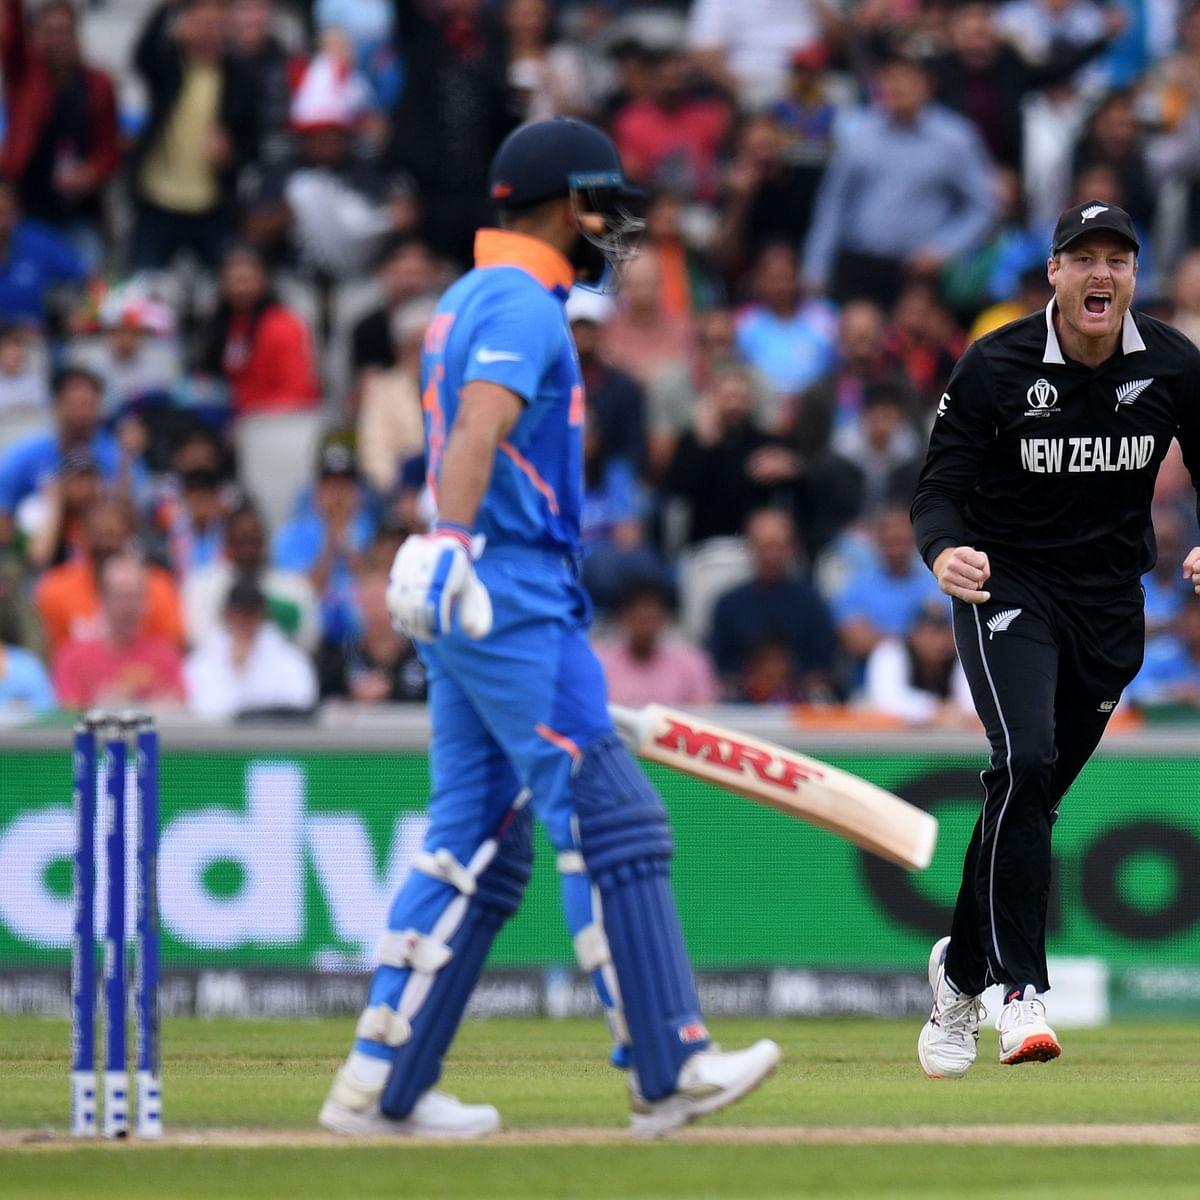 India vs New Zealand 1st Semi-Final: Captain Virat Kohli out for 1, Boult jolt for India